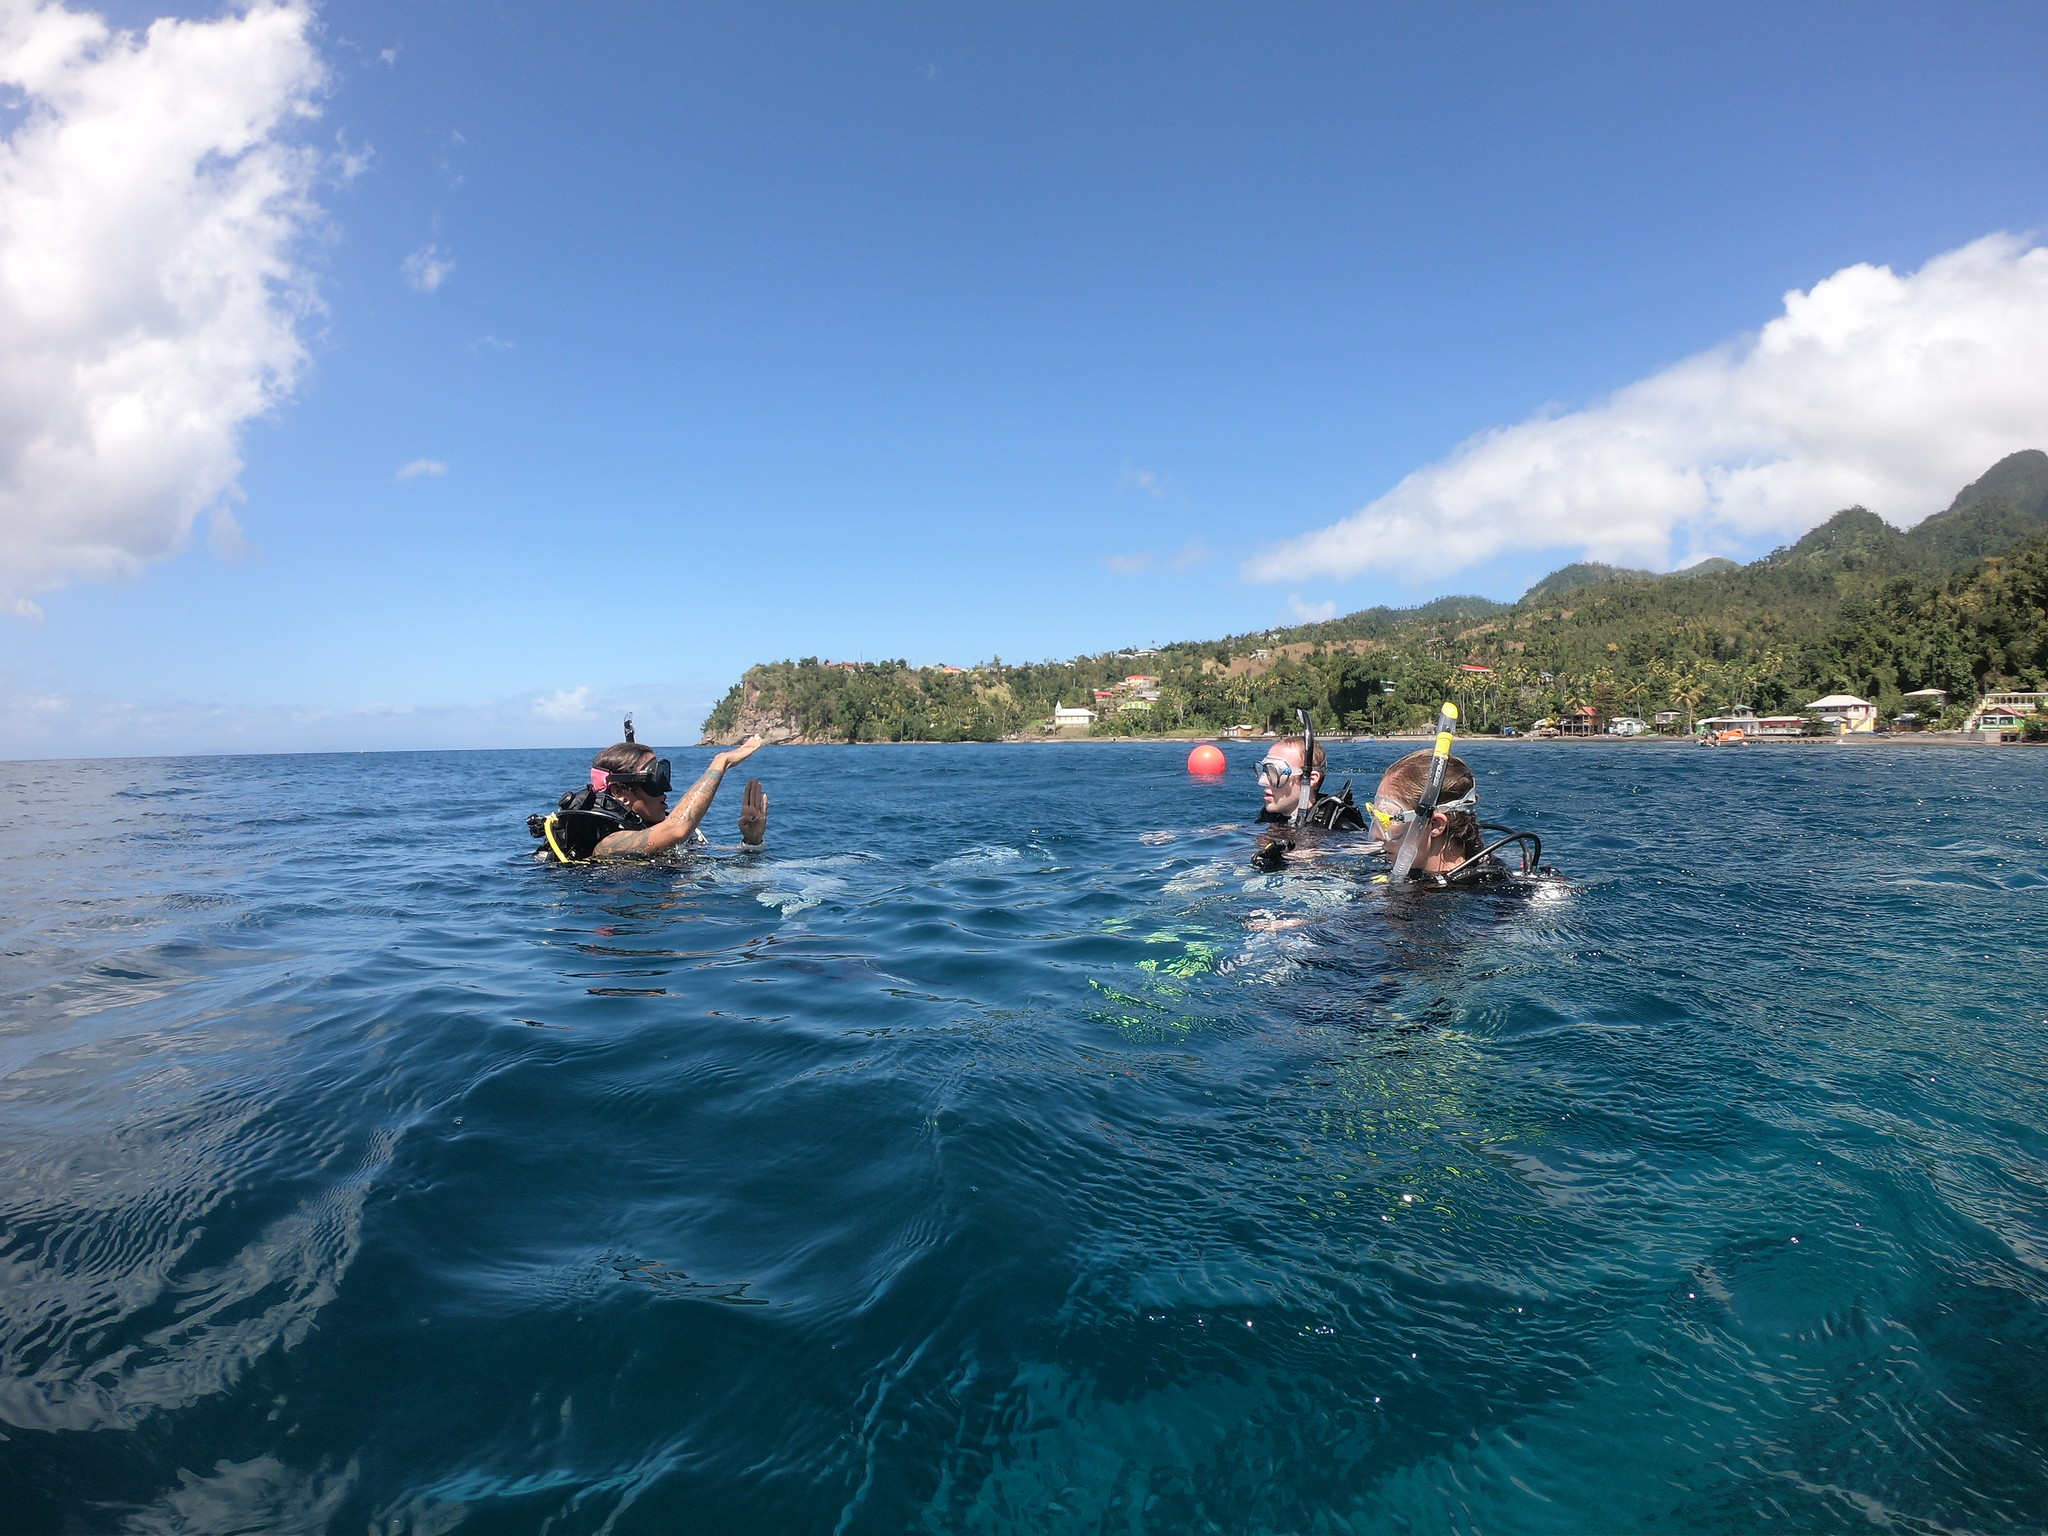 kayla salt scuba diving dominica west indies toucari bay.jpg